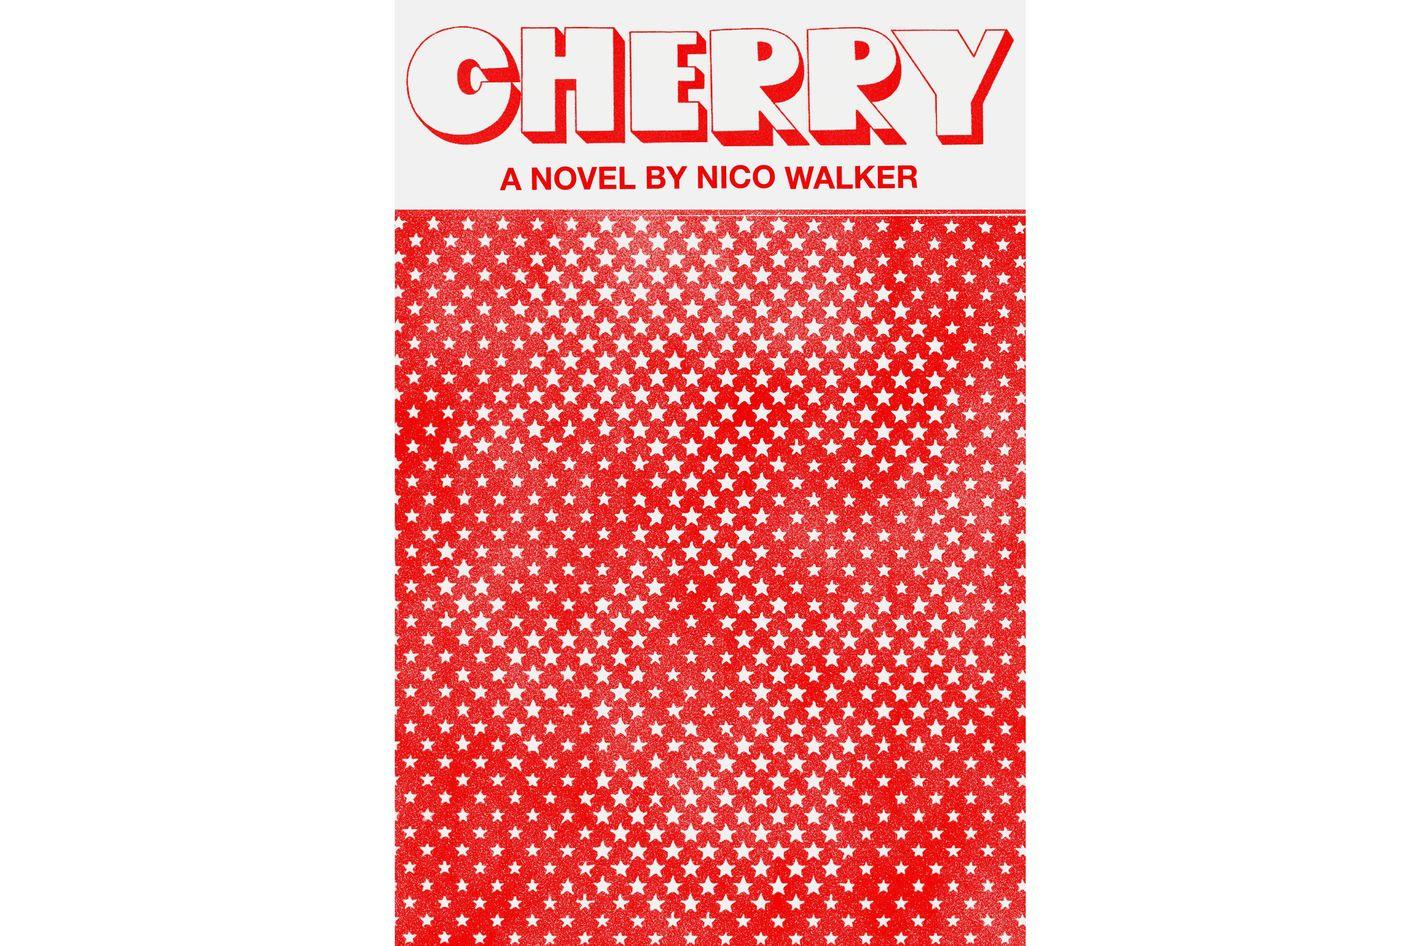 Cherry, by Nico Walker